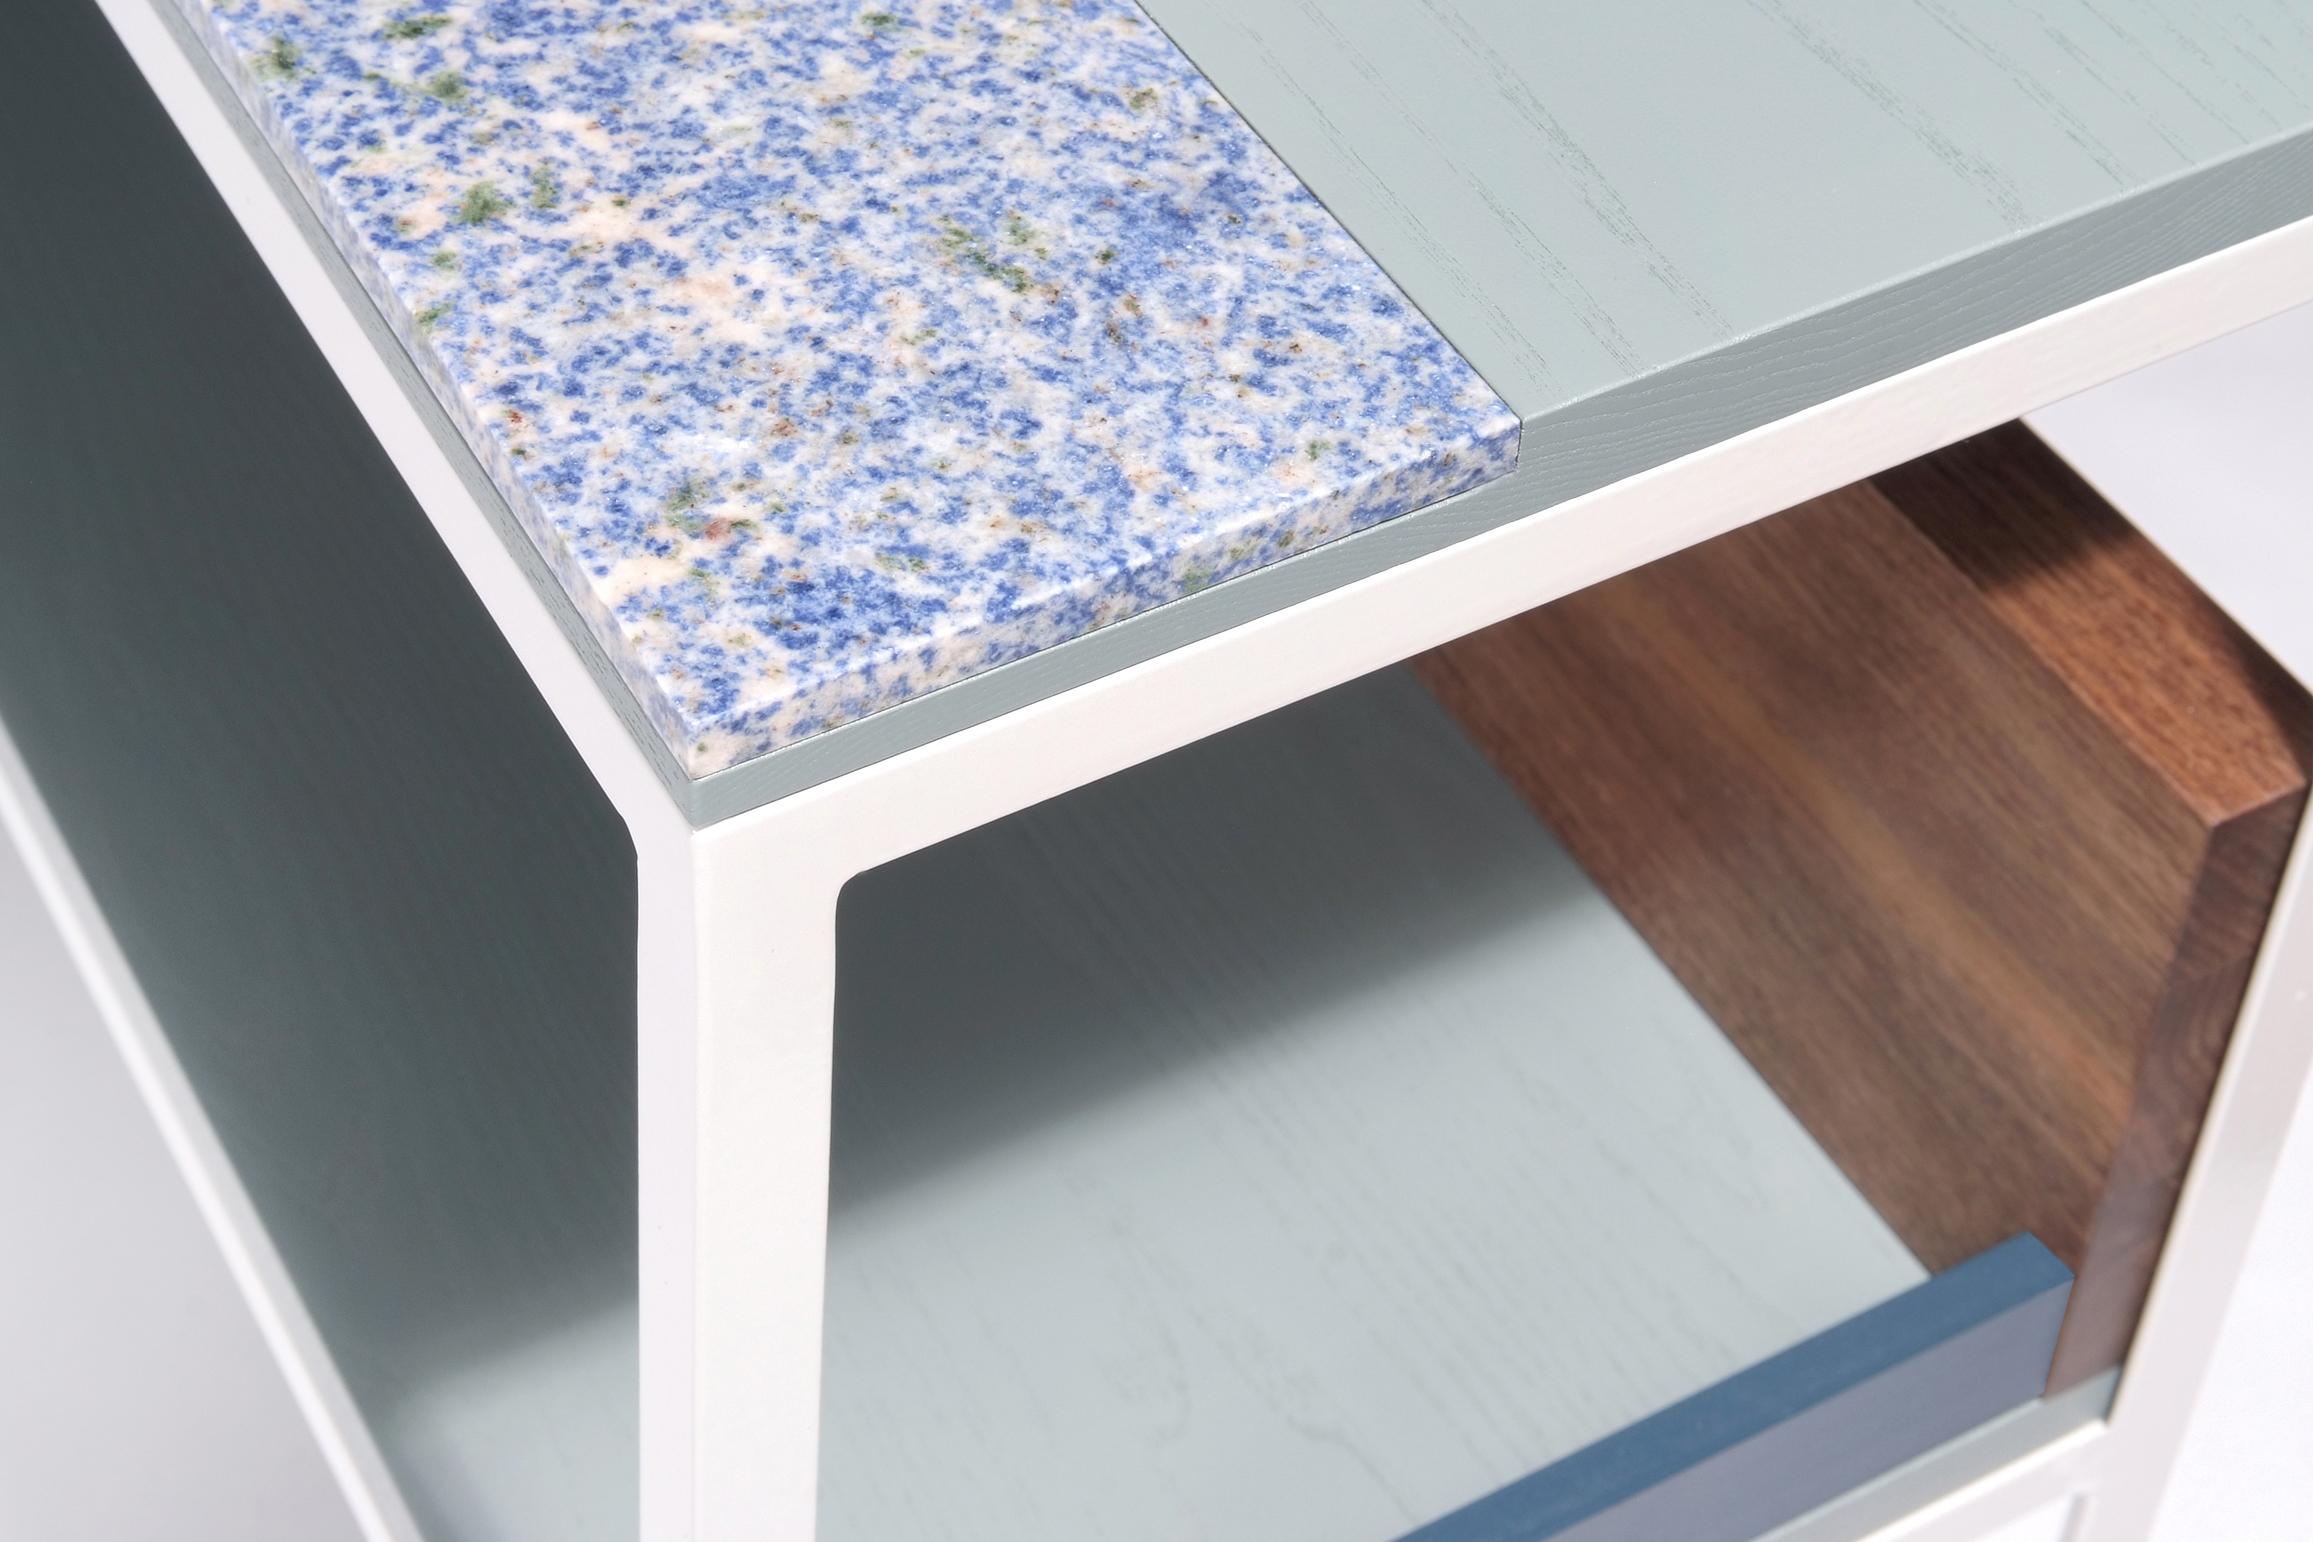 tablescapeI-02-zoemowat.jpg